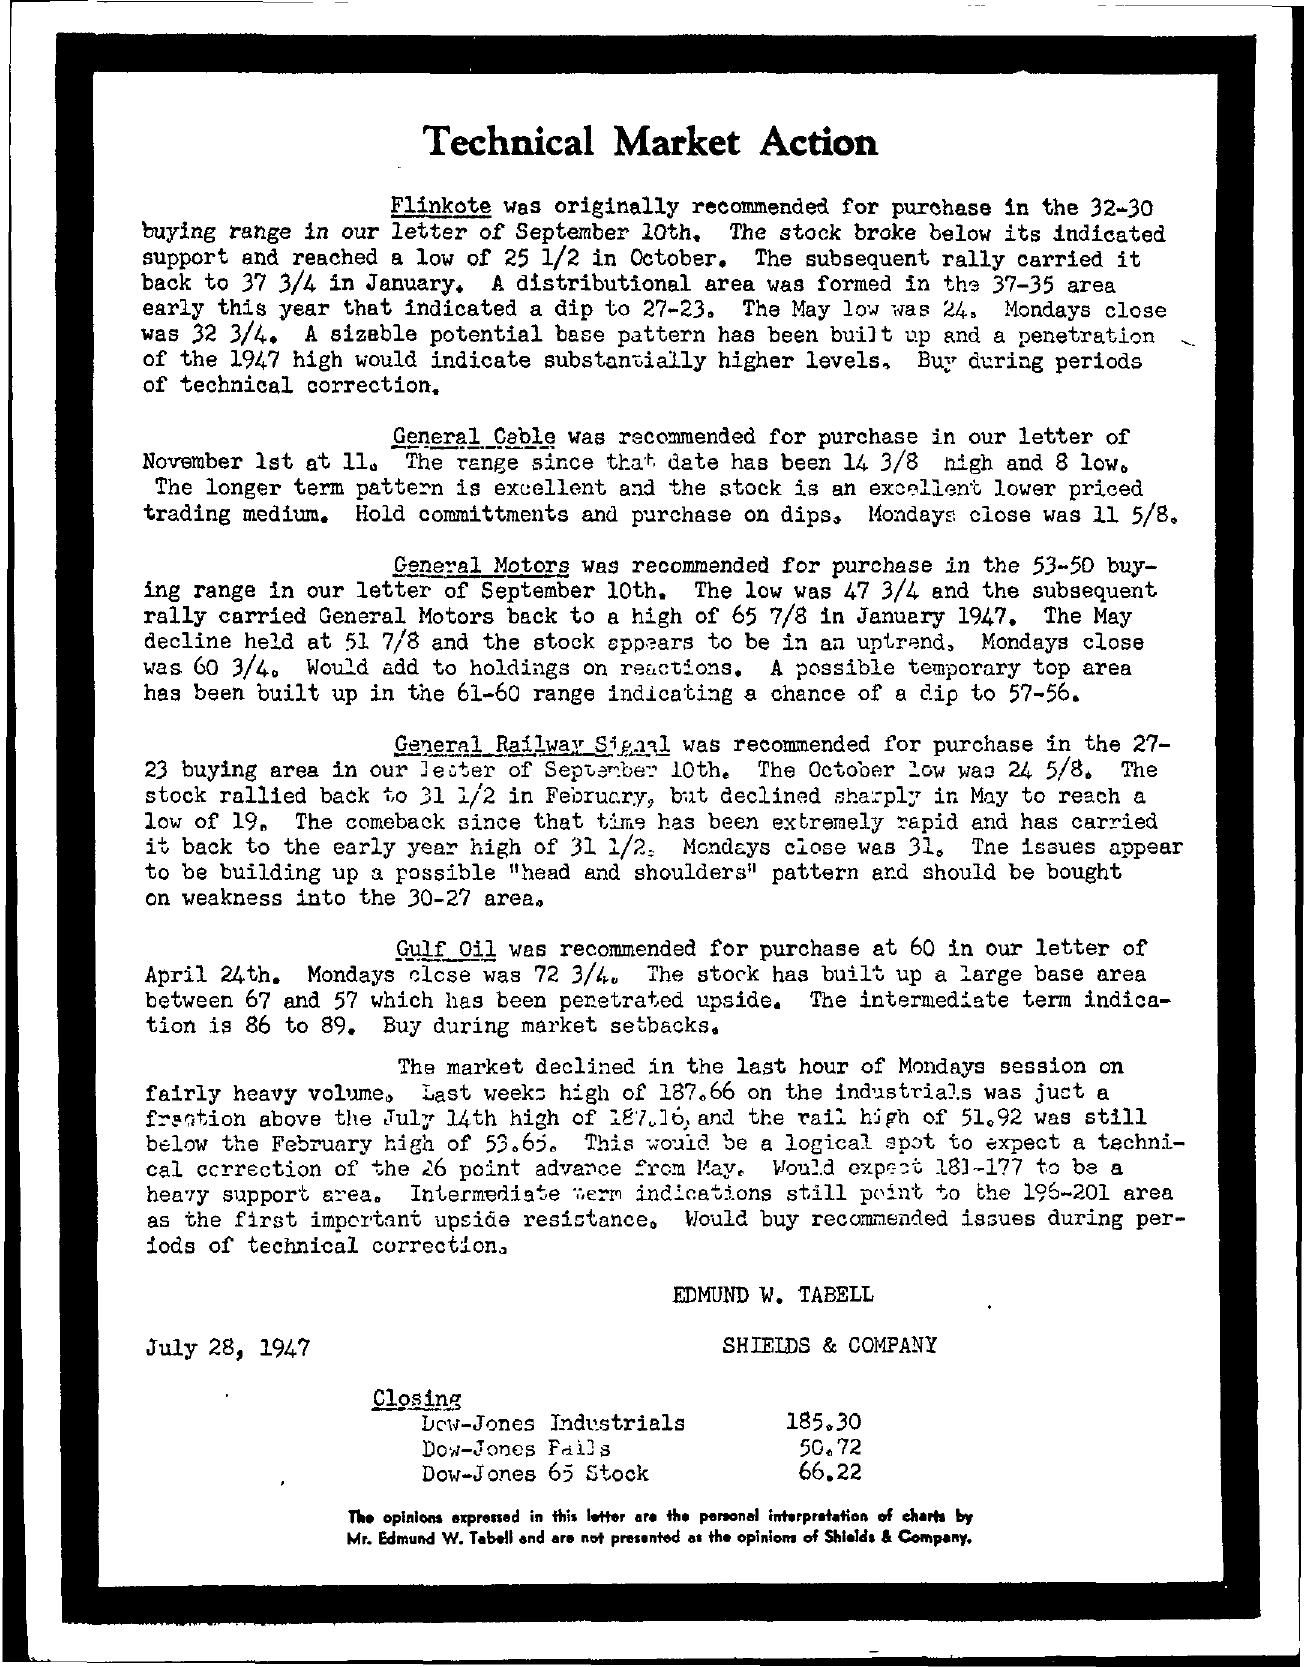 Tabell's Market Letter - July 28, 1947